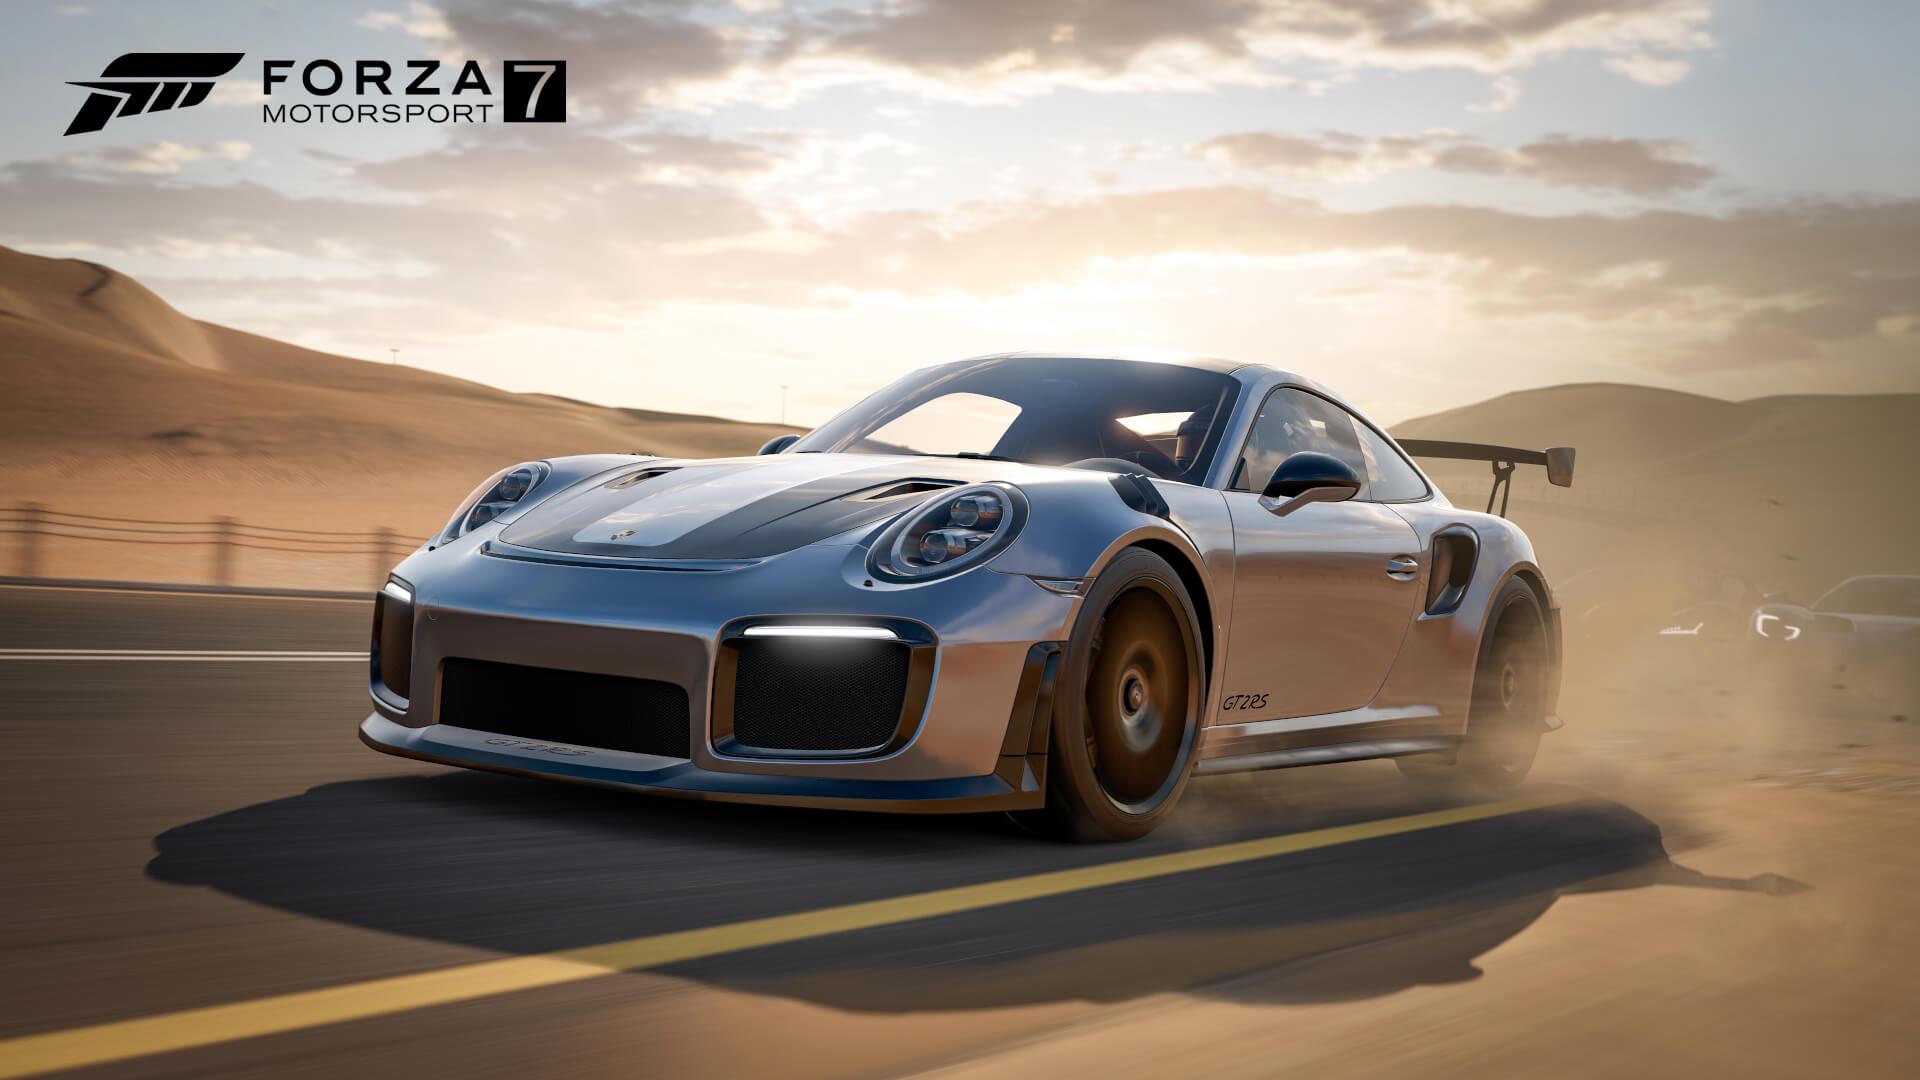 Forza Motorsport 7 Loyalty Rewards Updated Following Prize